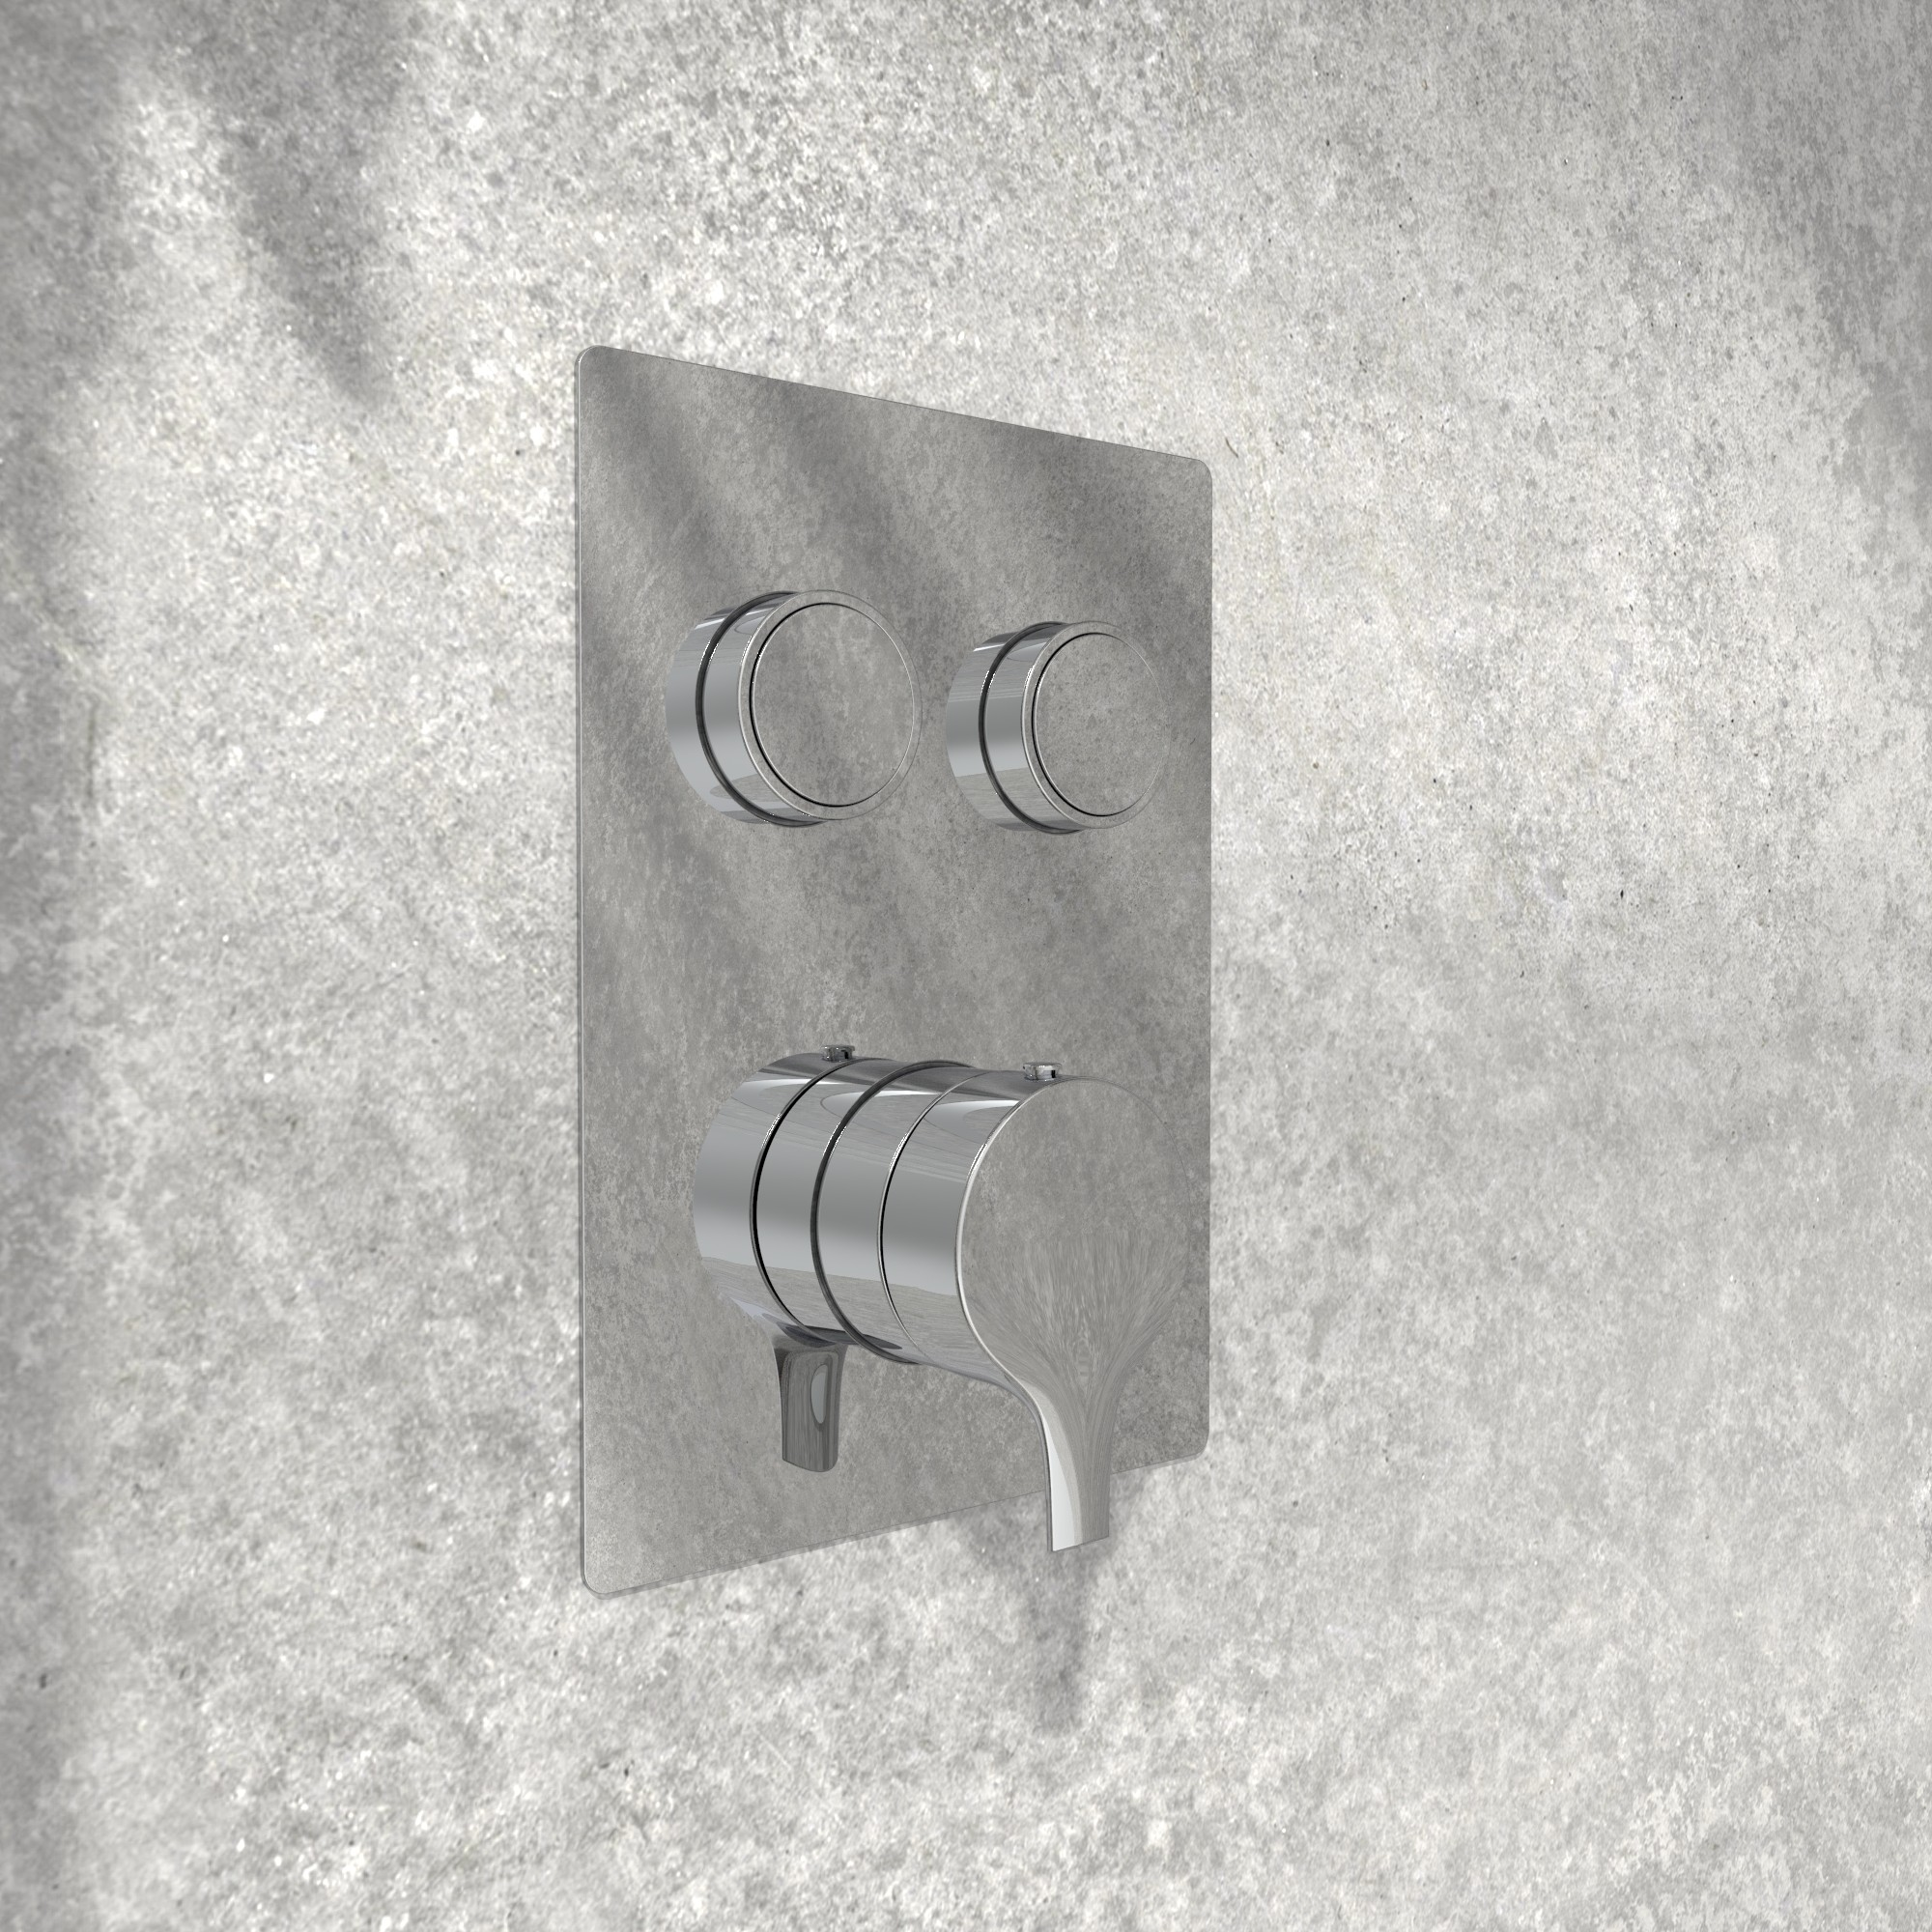 NOB98TS2DBTCP valve de robinet, garniture, sur mur de pierre